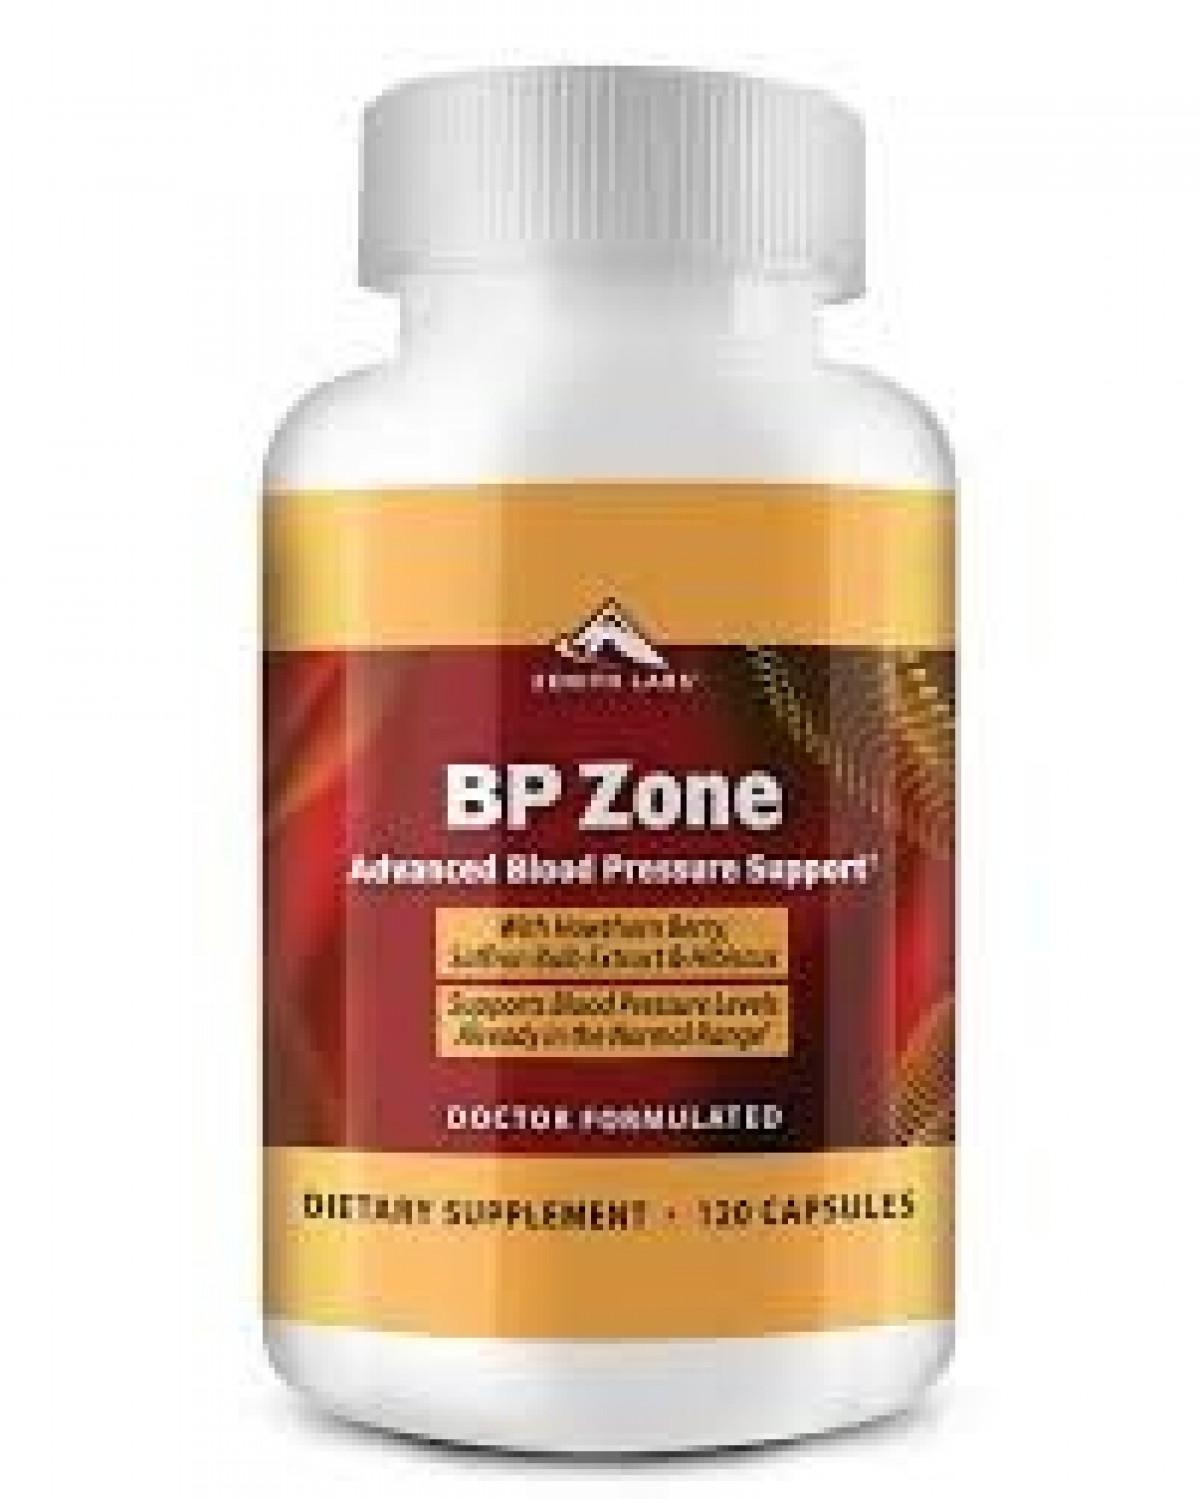 BP Zone Capsules